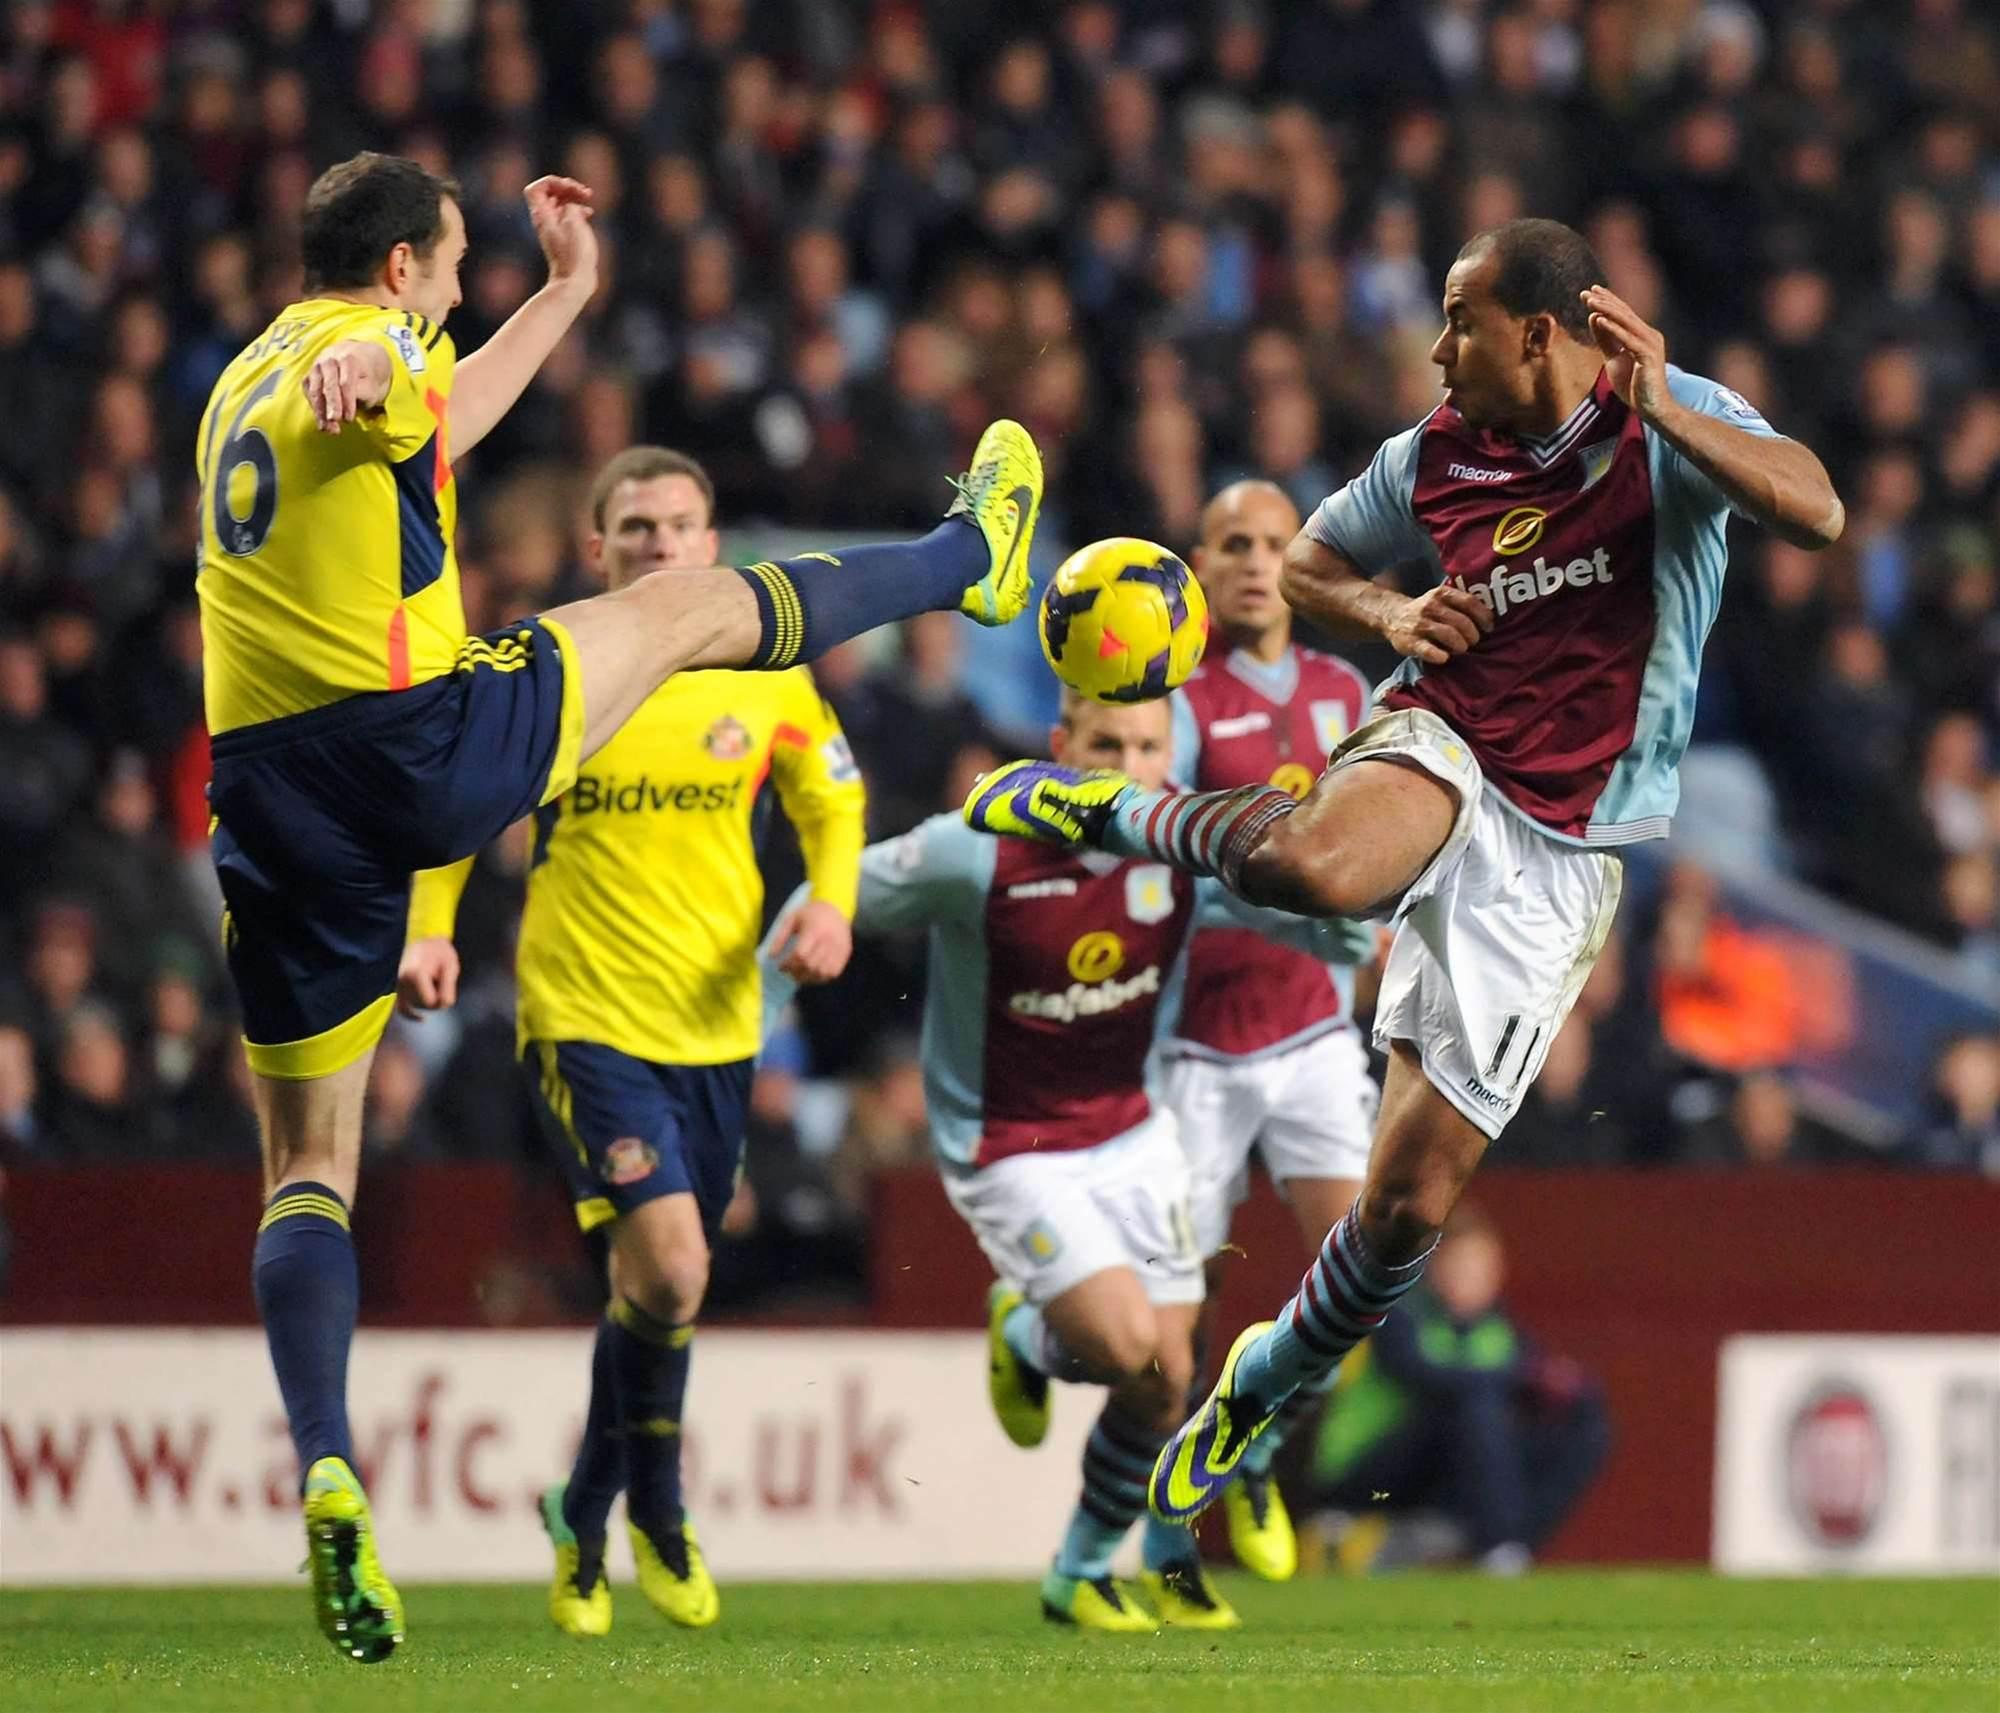 Sunderland draw 'progress', says Agbonlahor